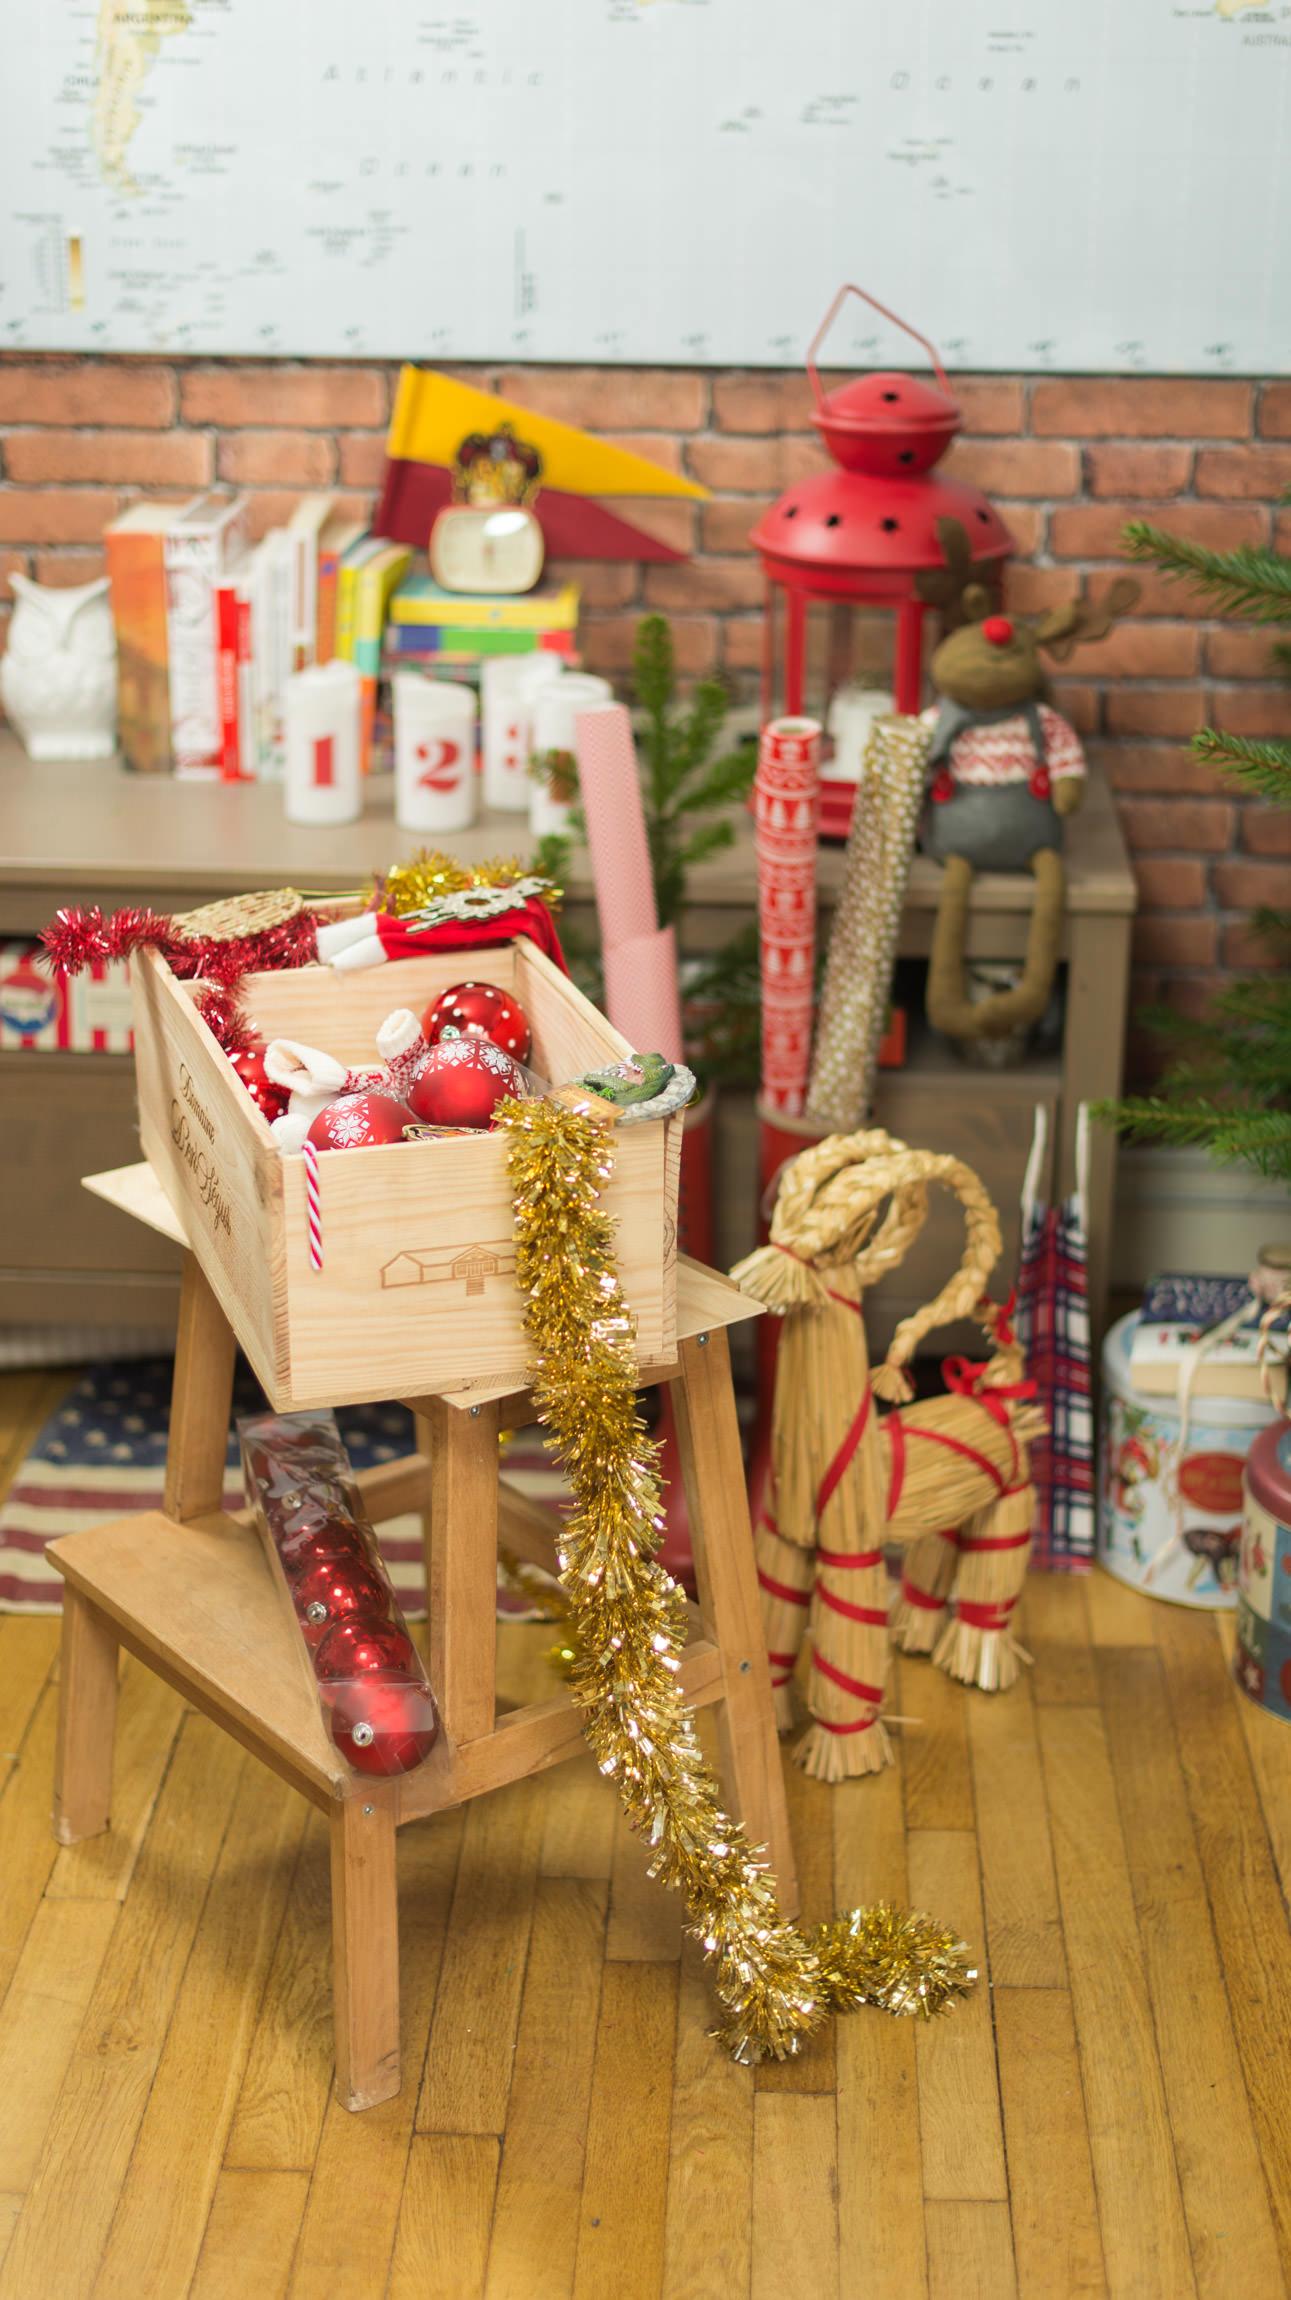 http://www.modeandthecity.net/looks/christmas-2014-1-mon-noel-avec-daniel-wellington-concours-inside/